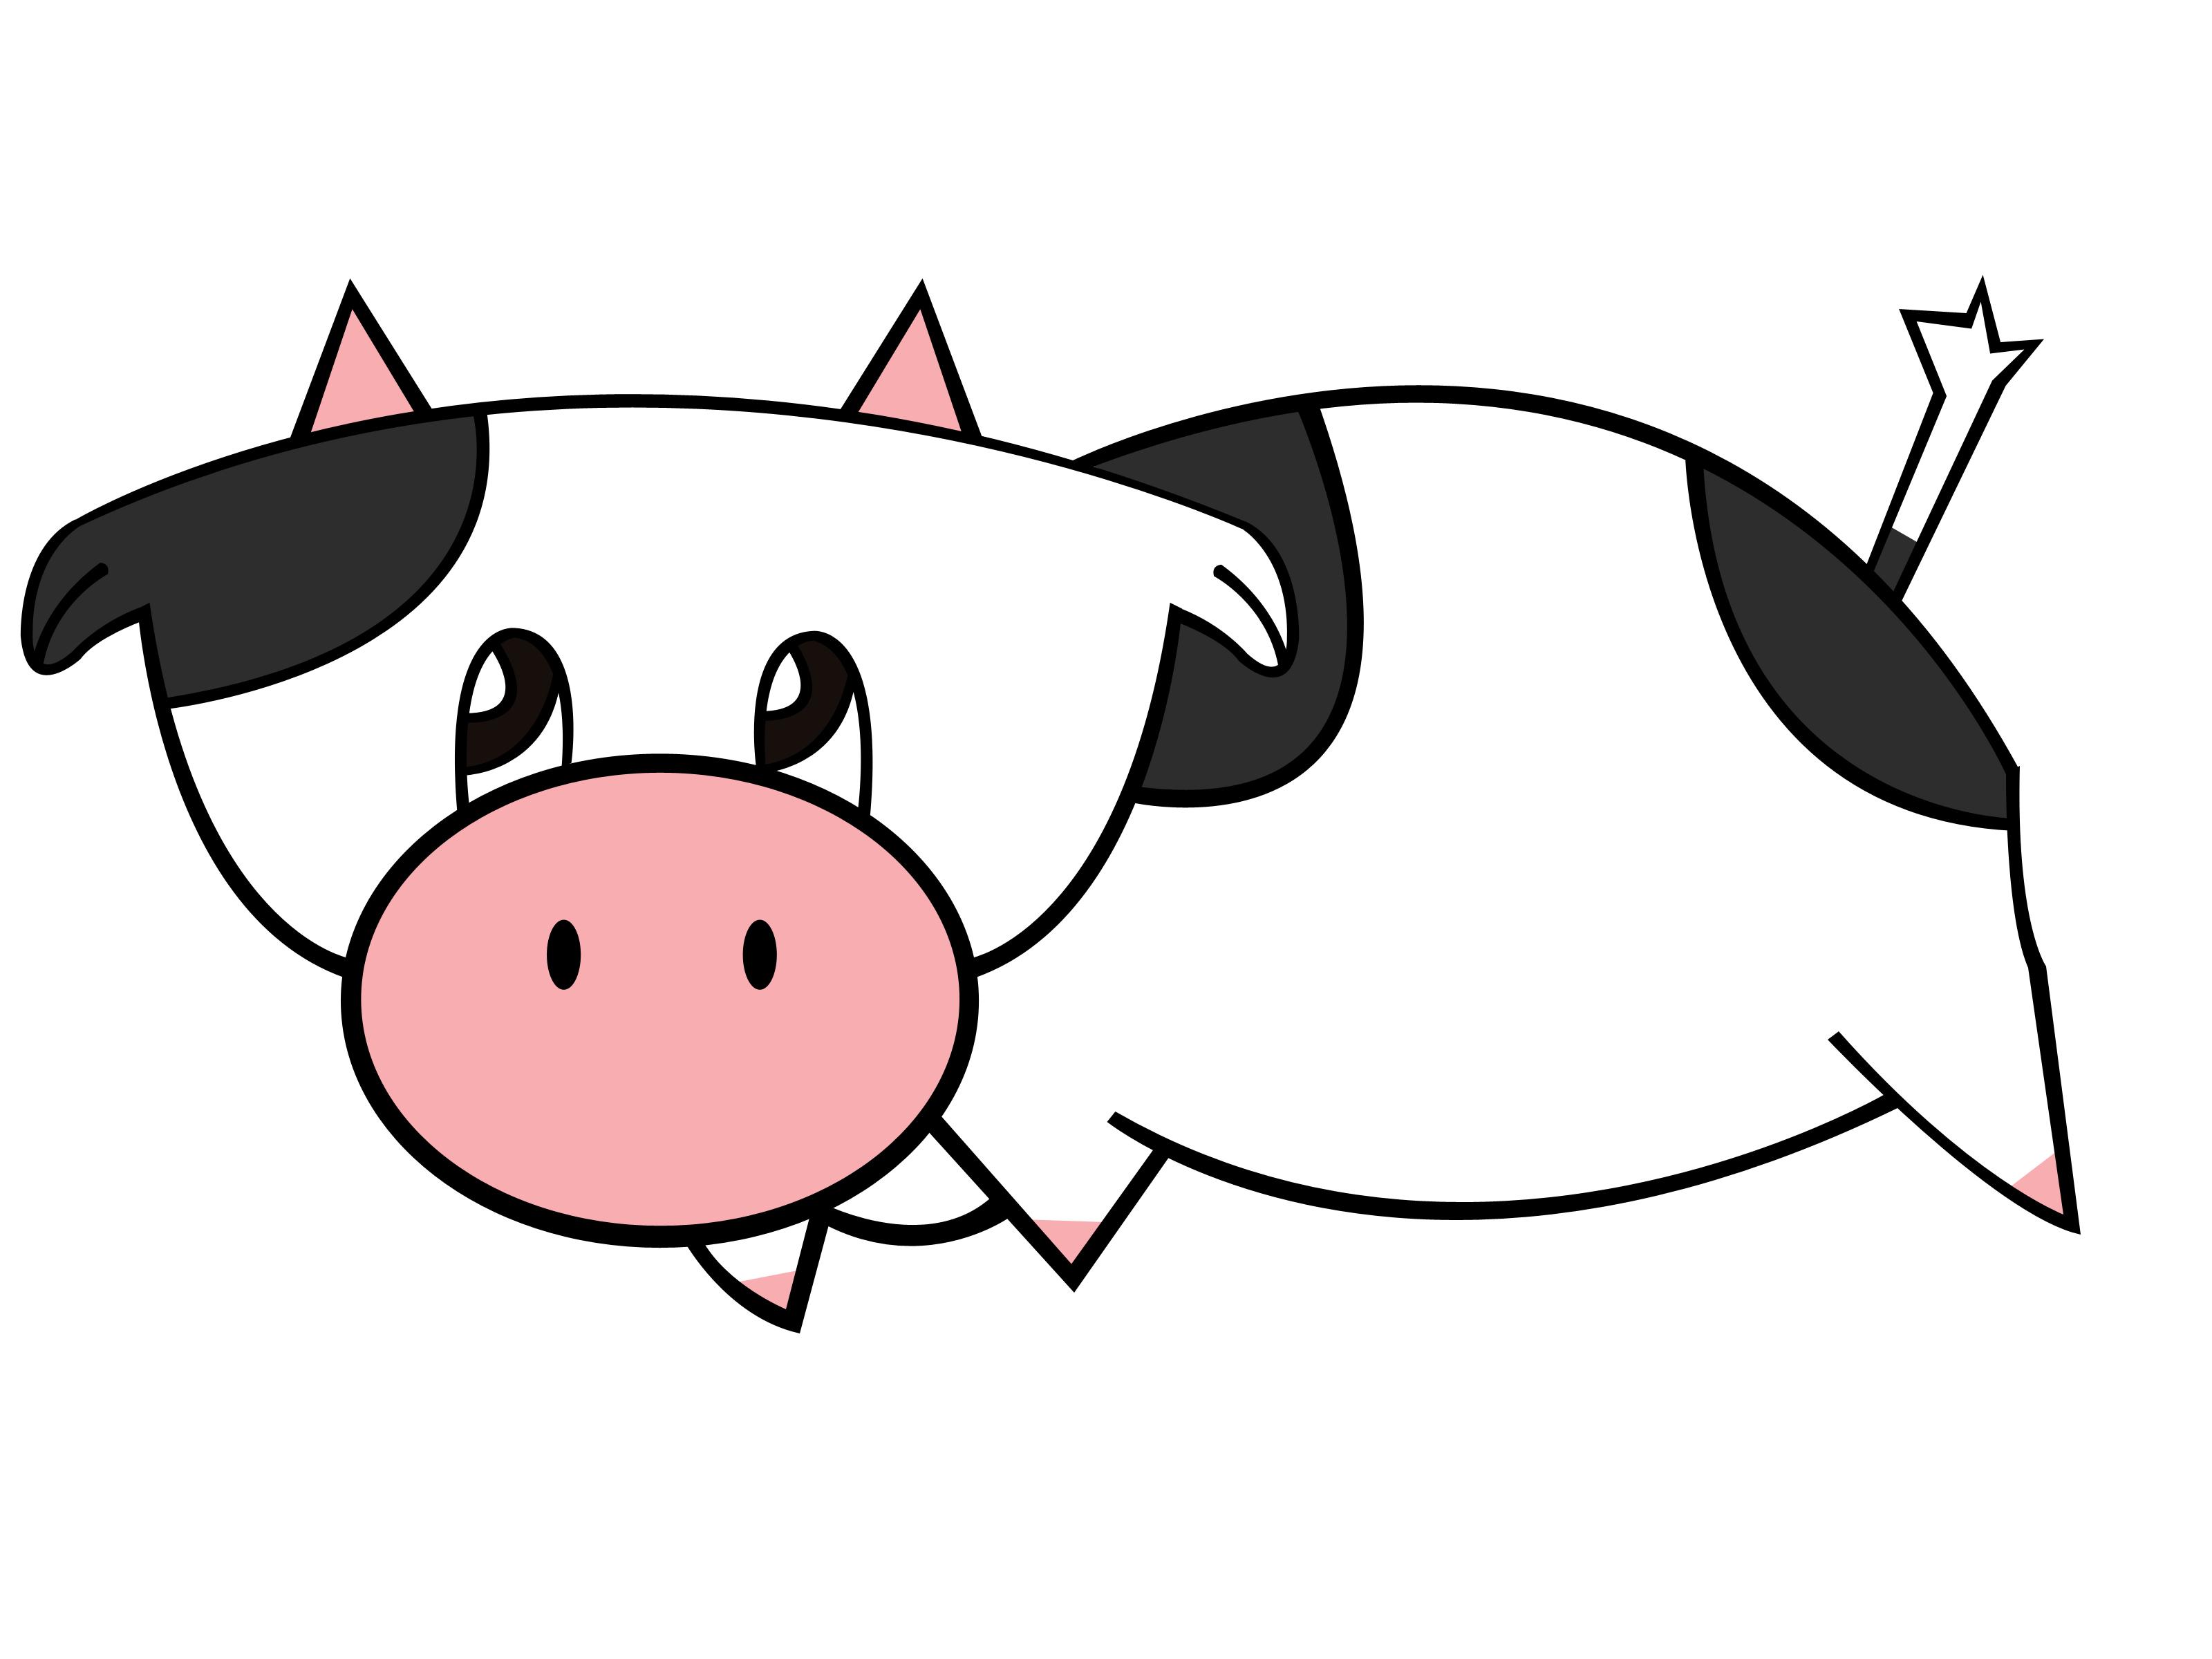 Drawn pig Drawn Cow How Free Clip Free Harvest